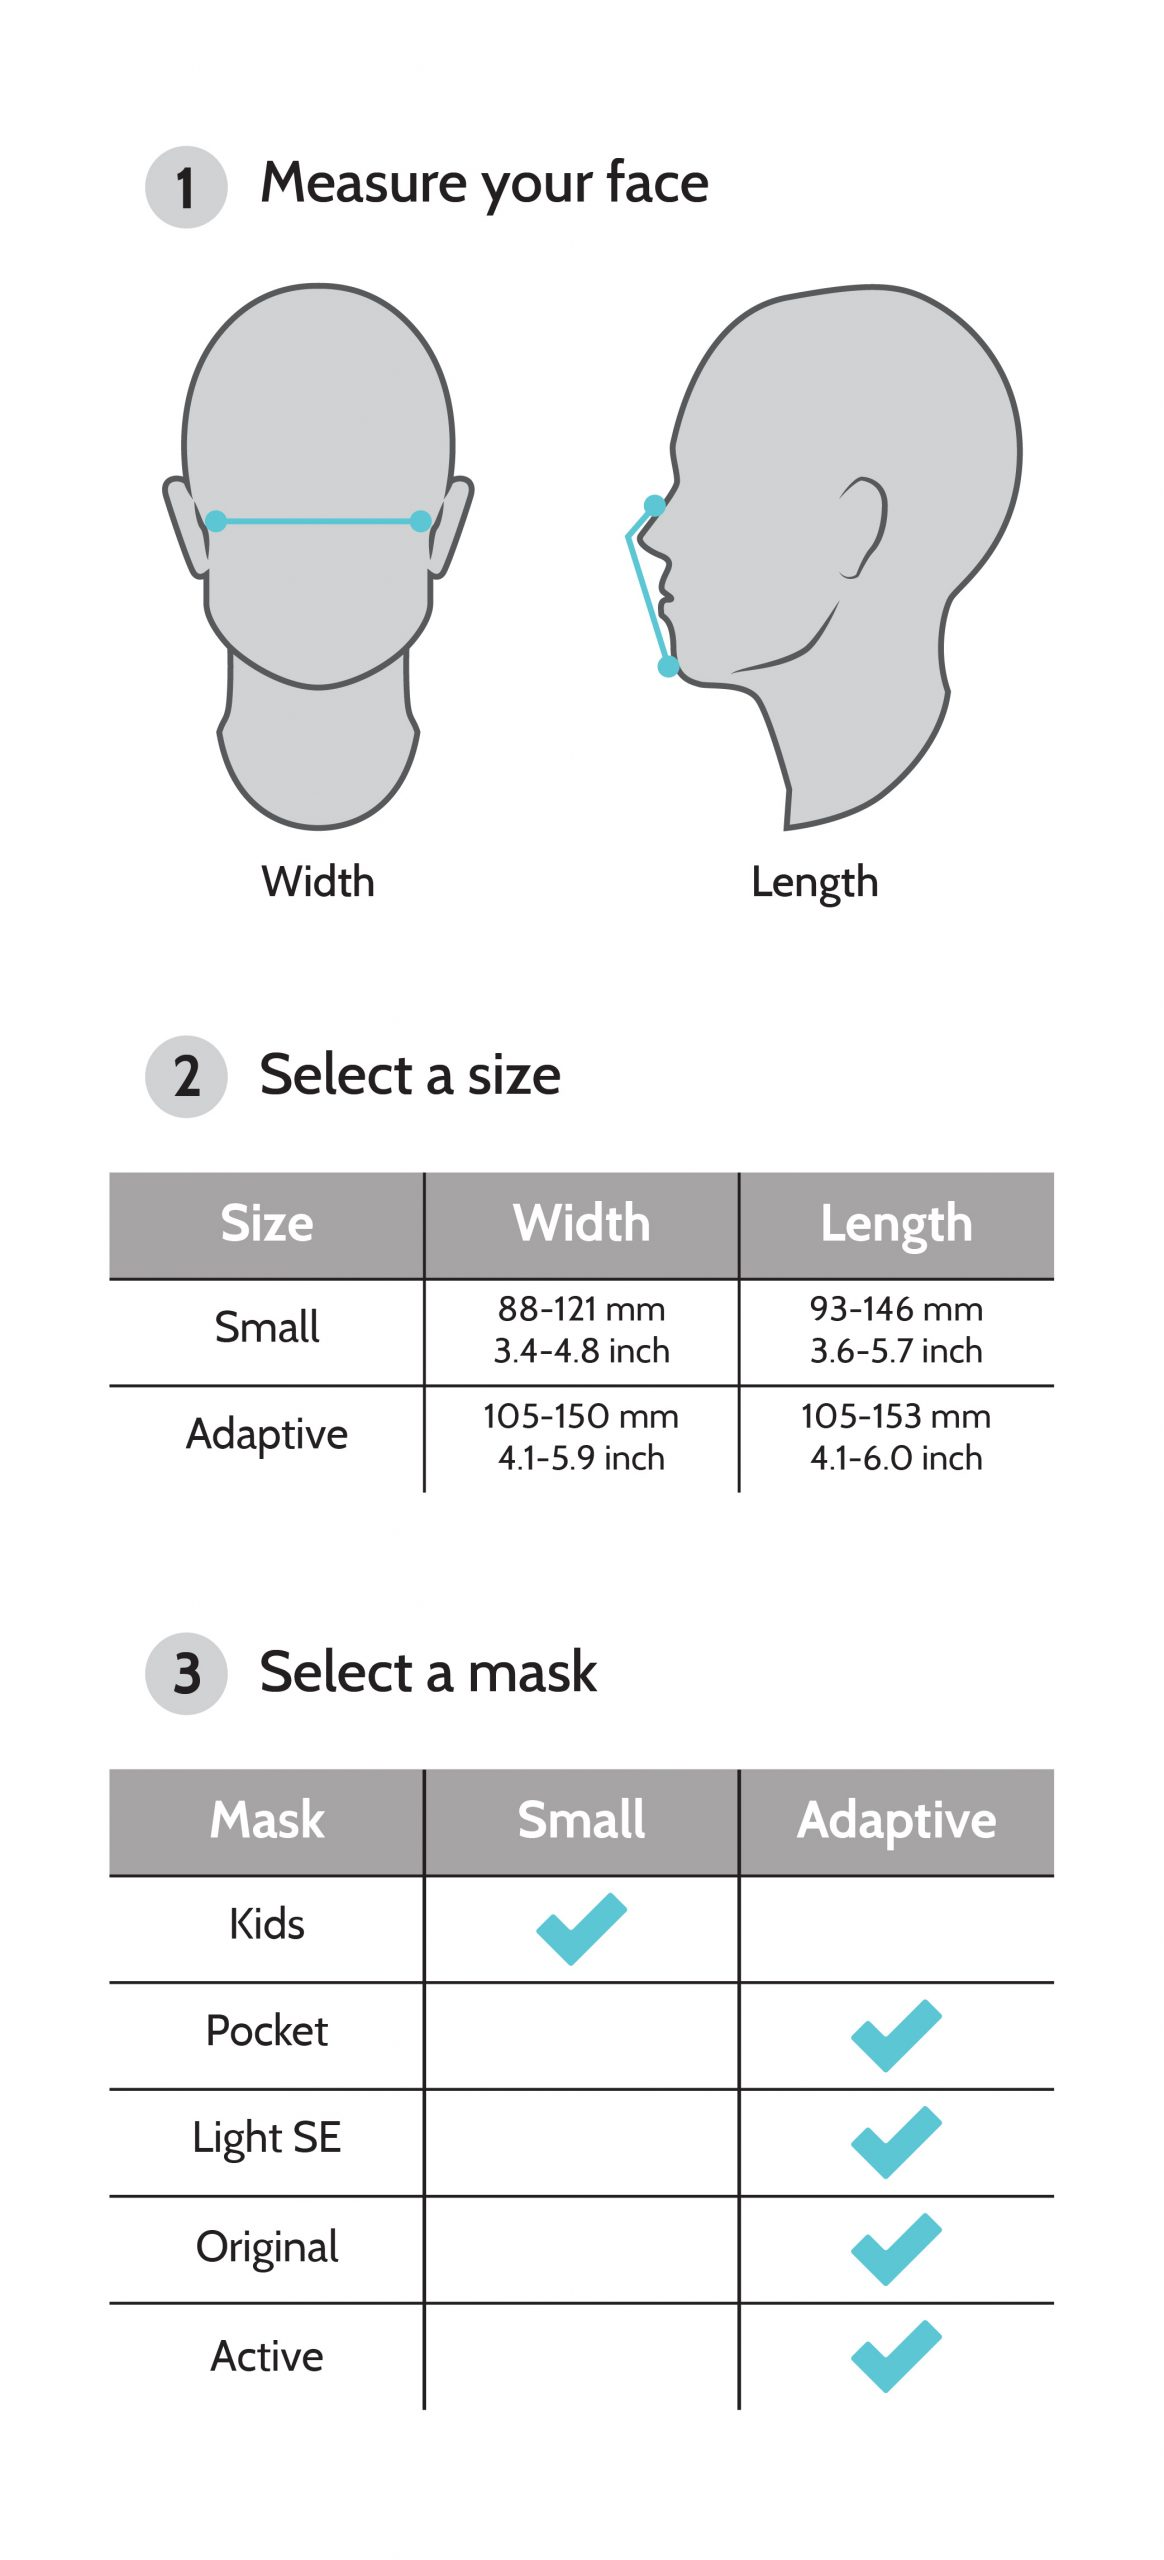 chọn size cho khẩu trang active smart mask